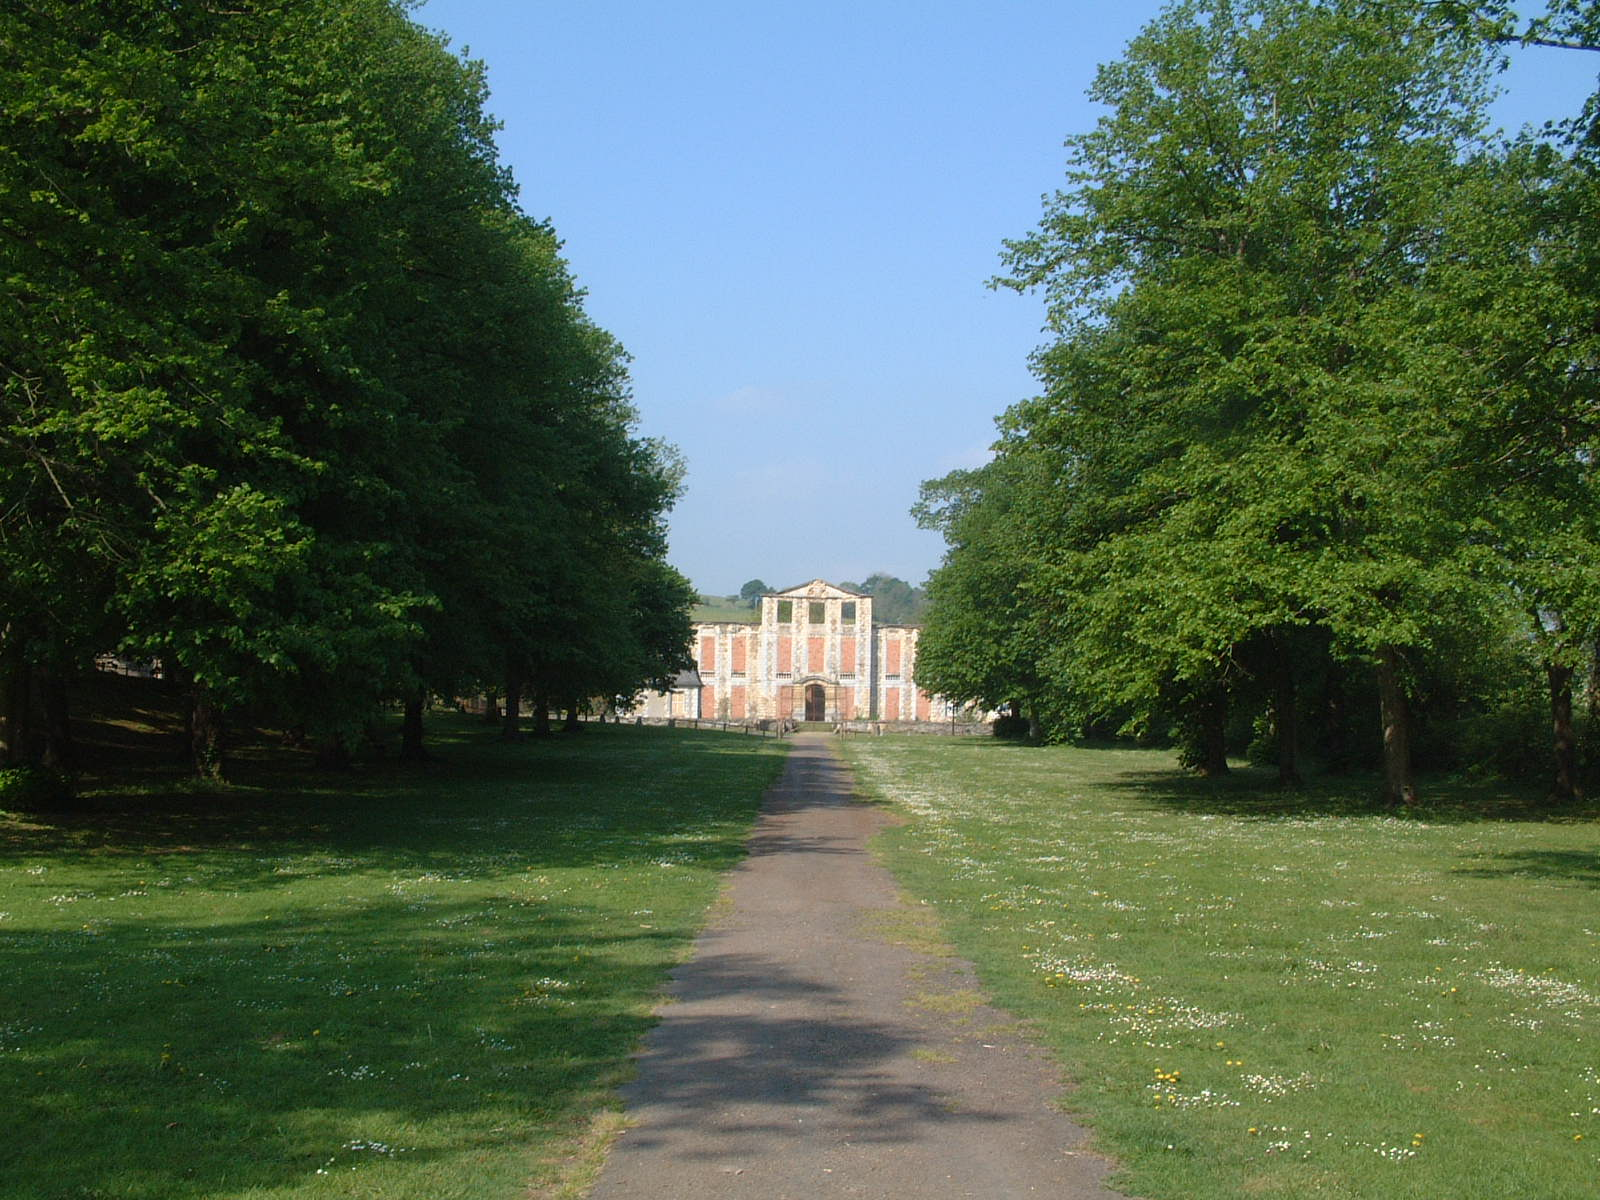 Thury-Harcourt Chateau